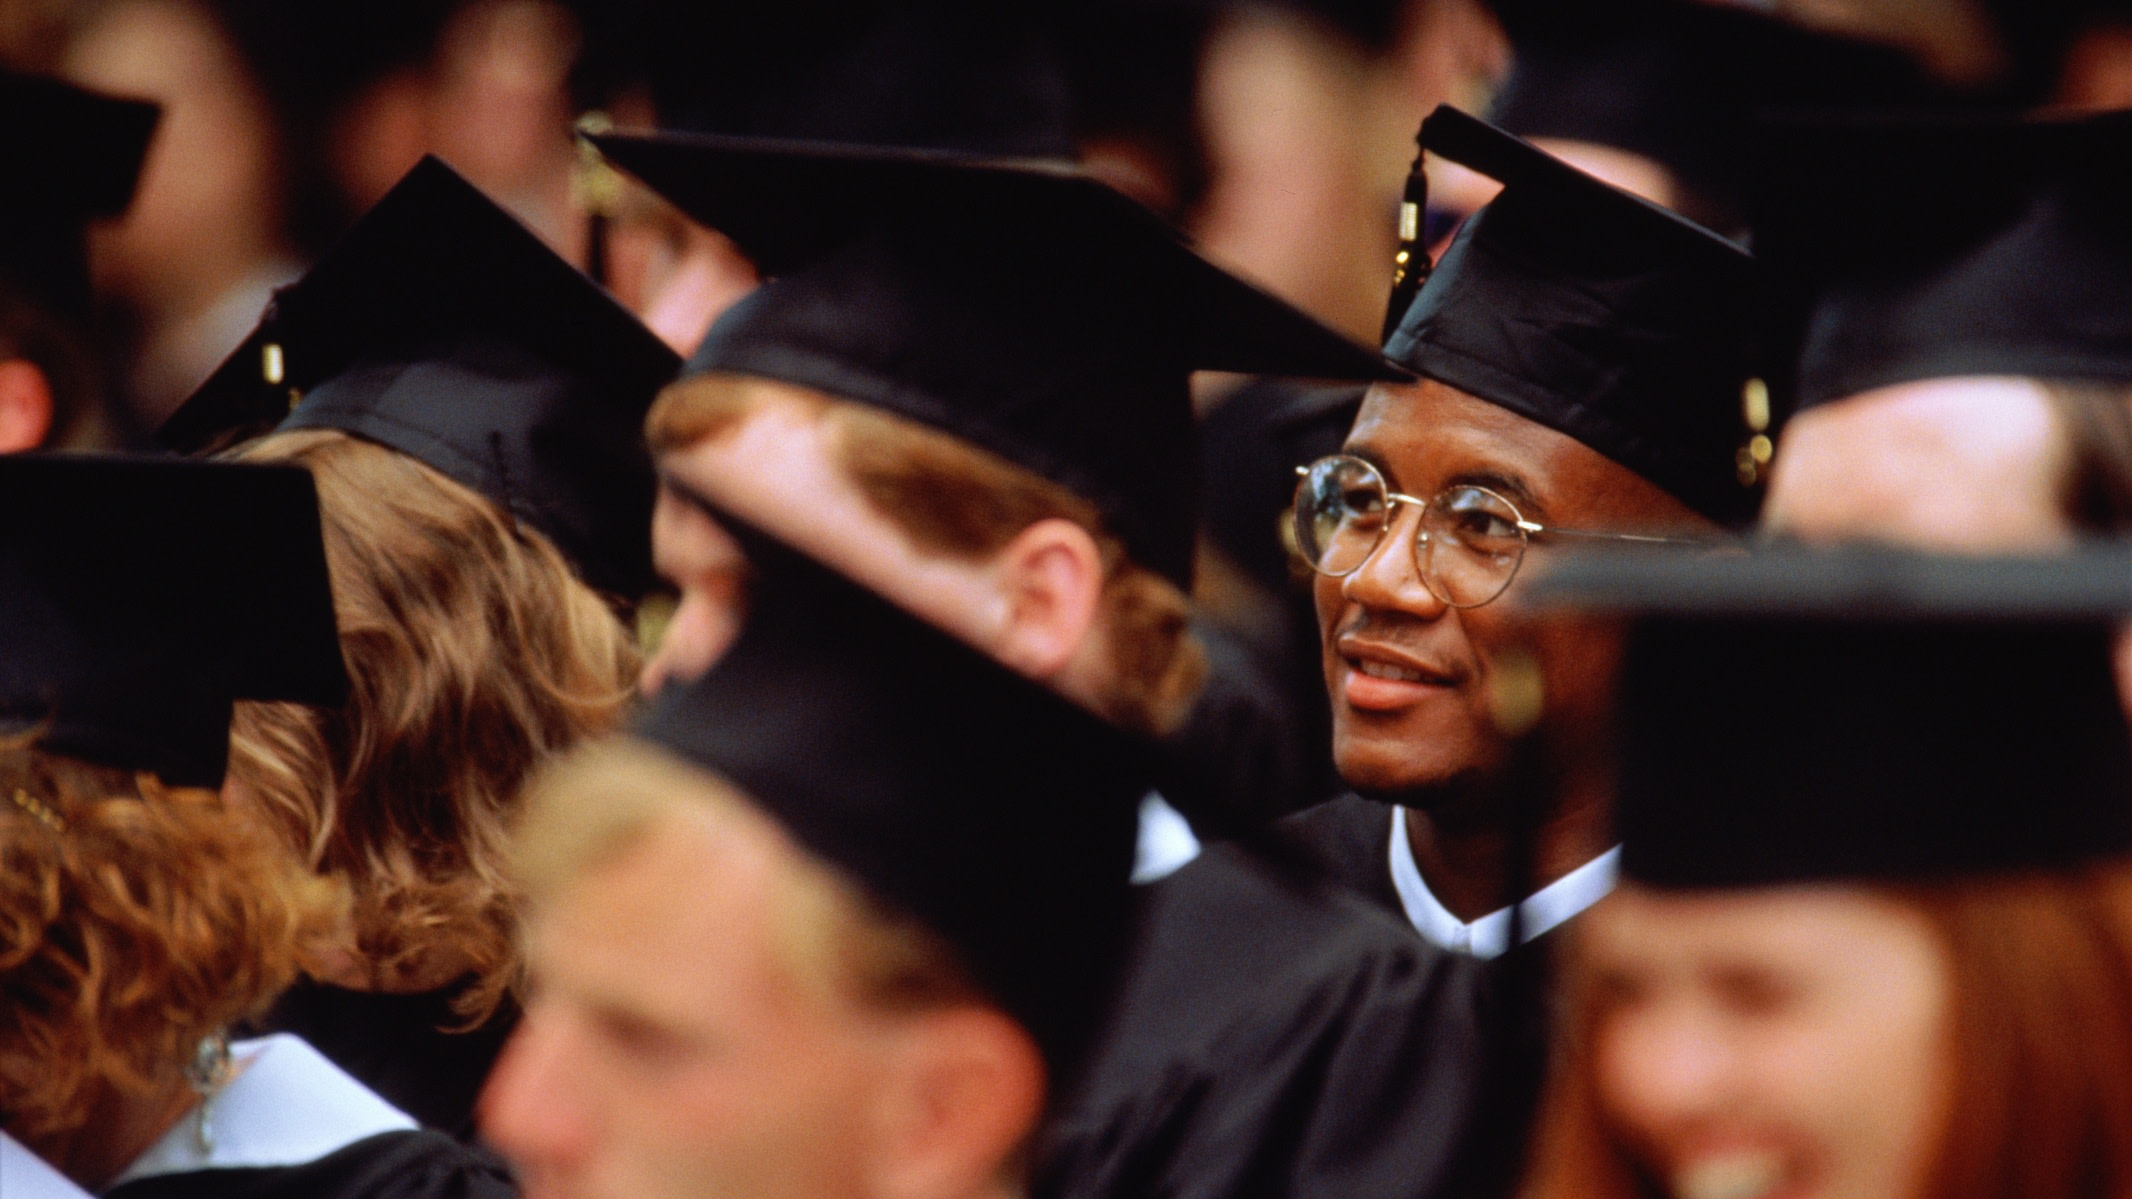 Black Florida High School Student Gets P.E. Award For Football But No Summa Cum Laude Despite 4.93 GPA